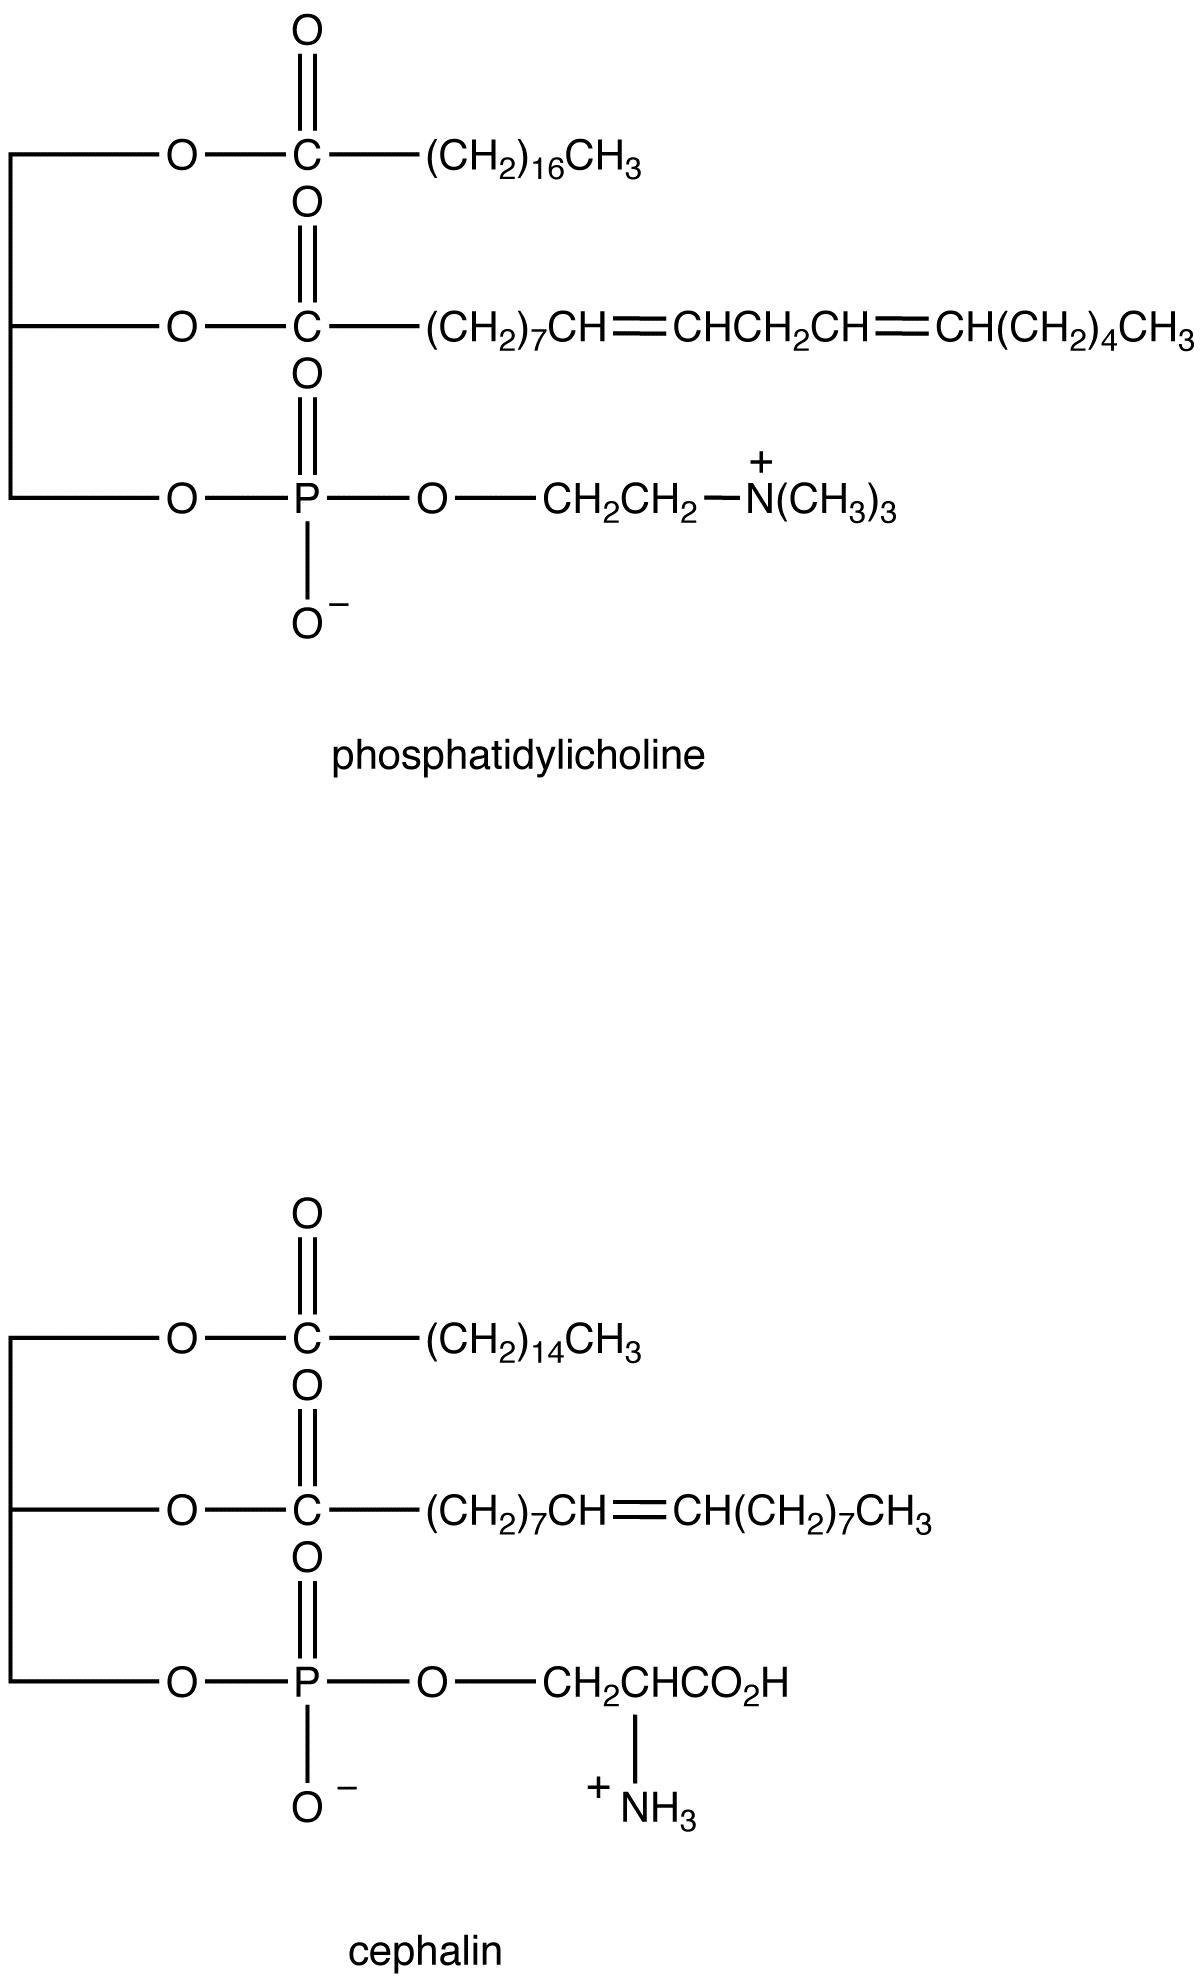 Phosphoglyceride Ochempal